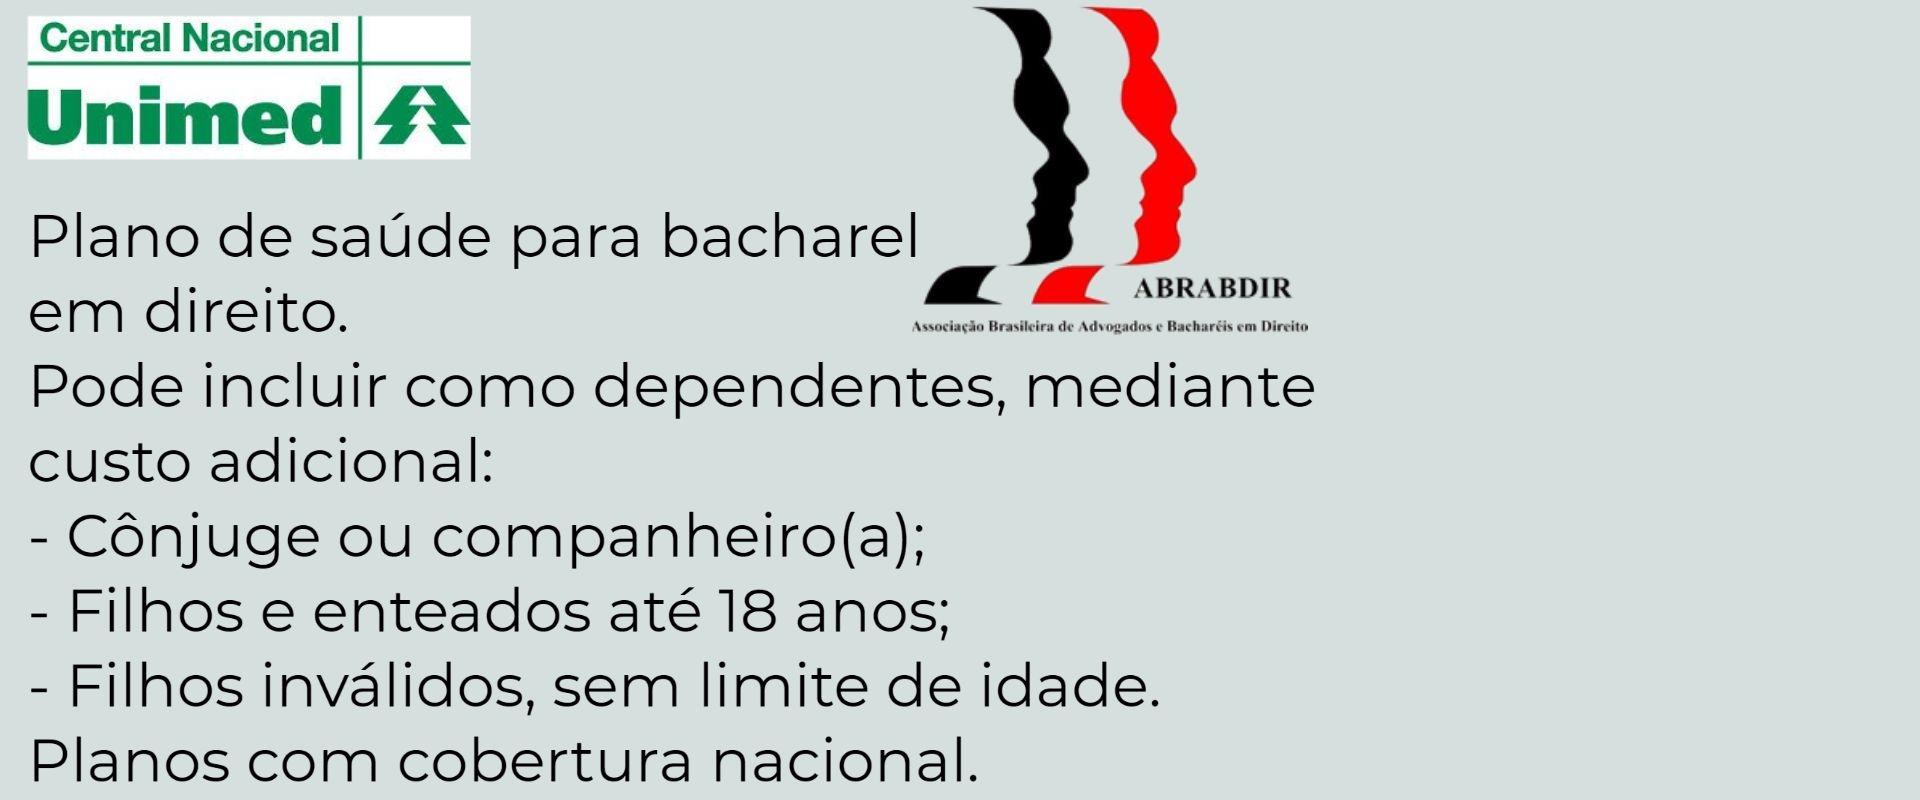 Unimed ABRABDIR Atibaia